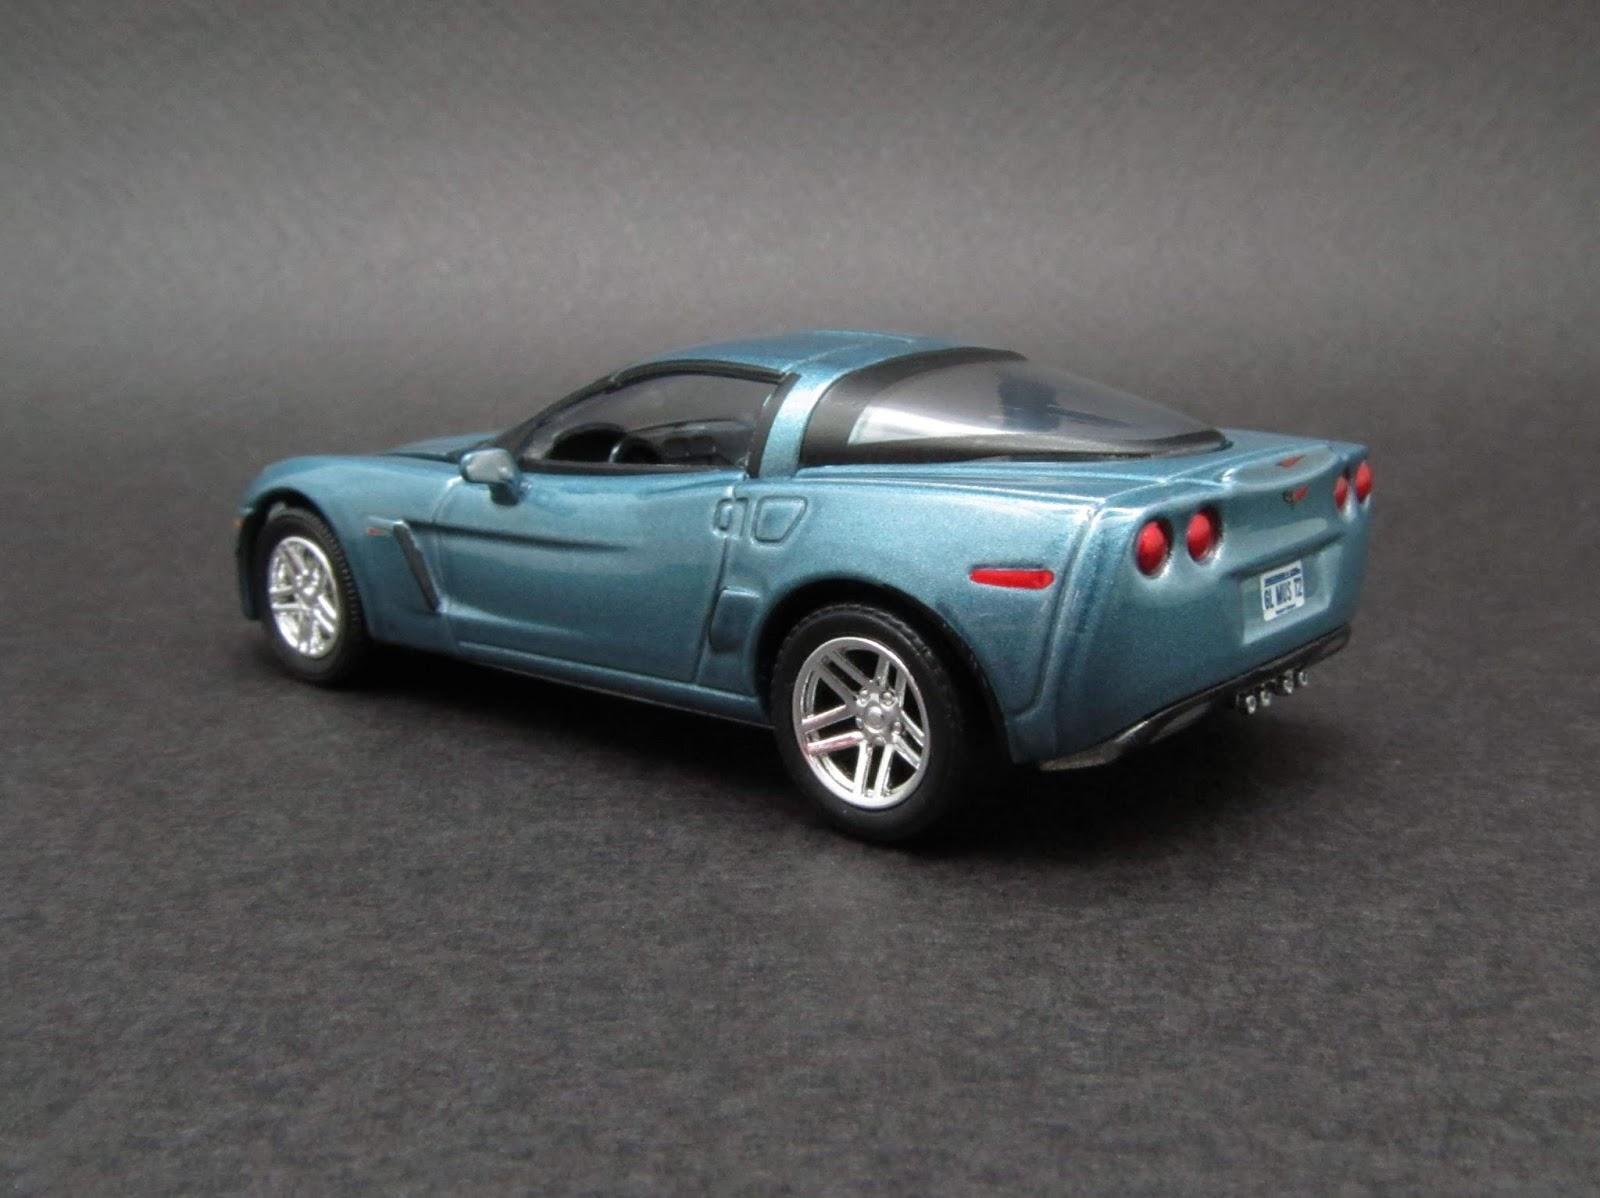 diecast hobbist 2010 chevrolet corvette z06. Black Bedroom Furniture Sets. Home Design Ideas